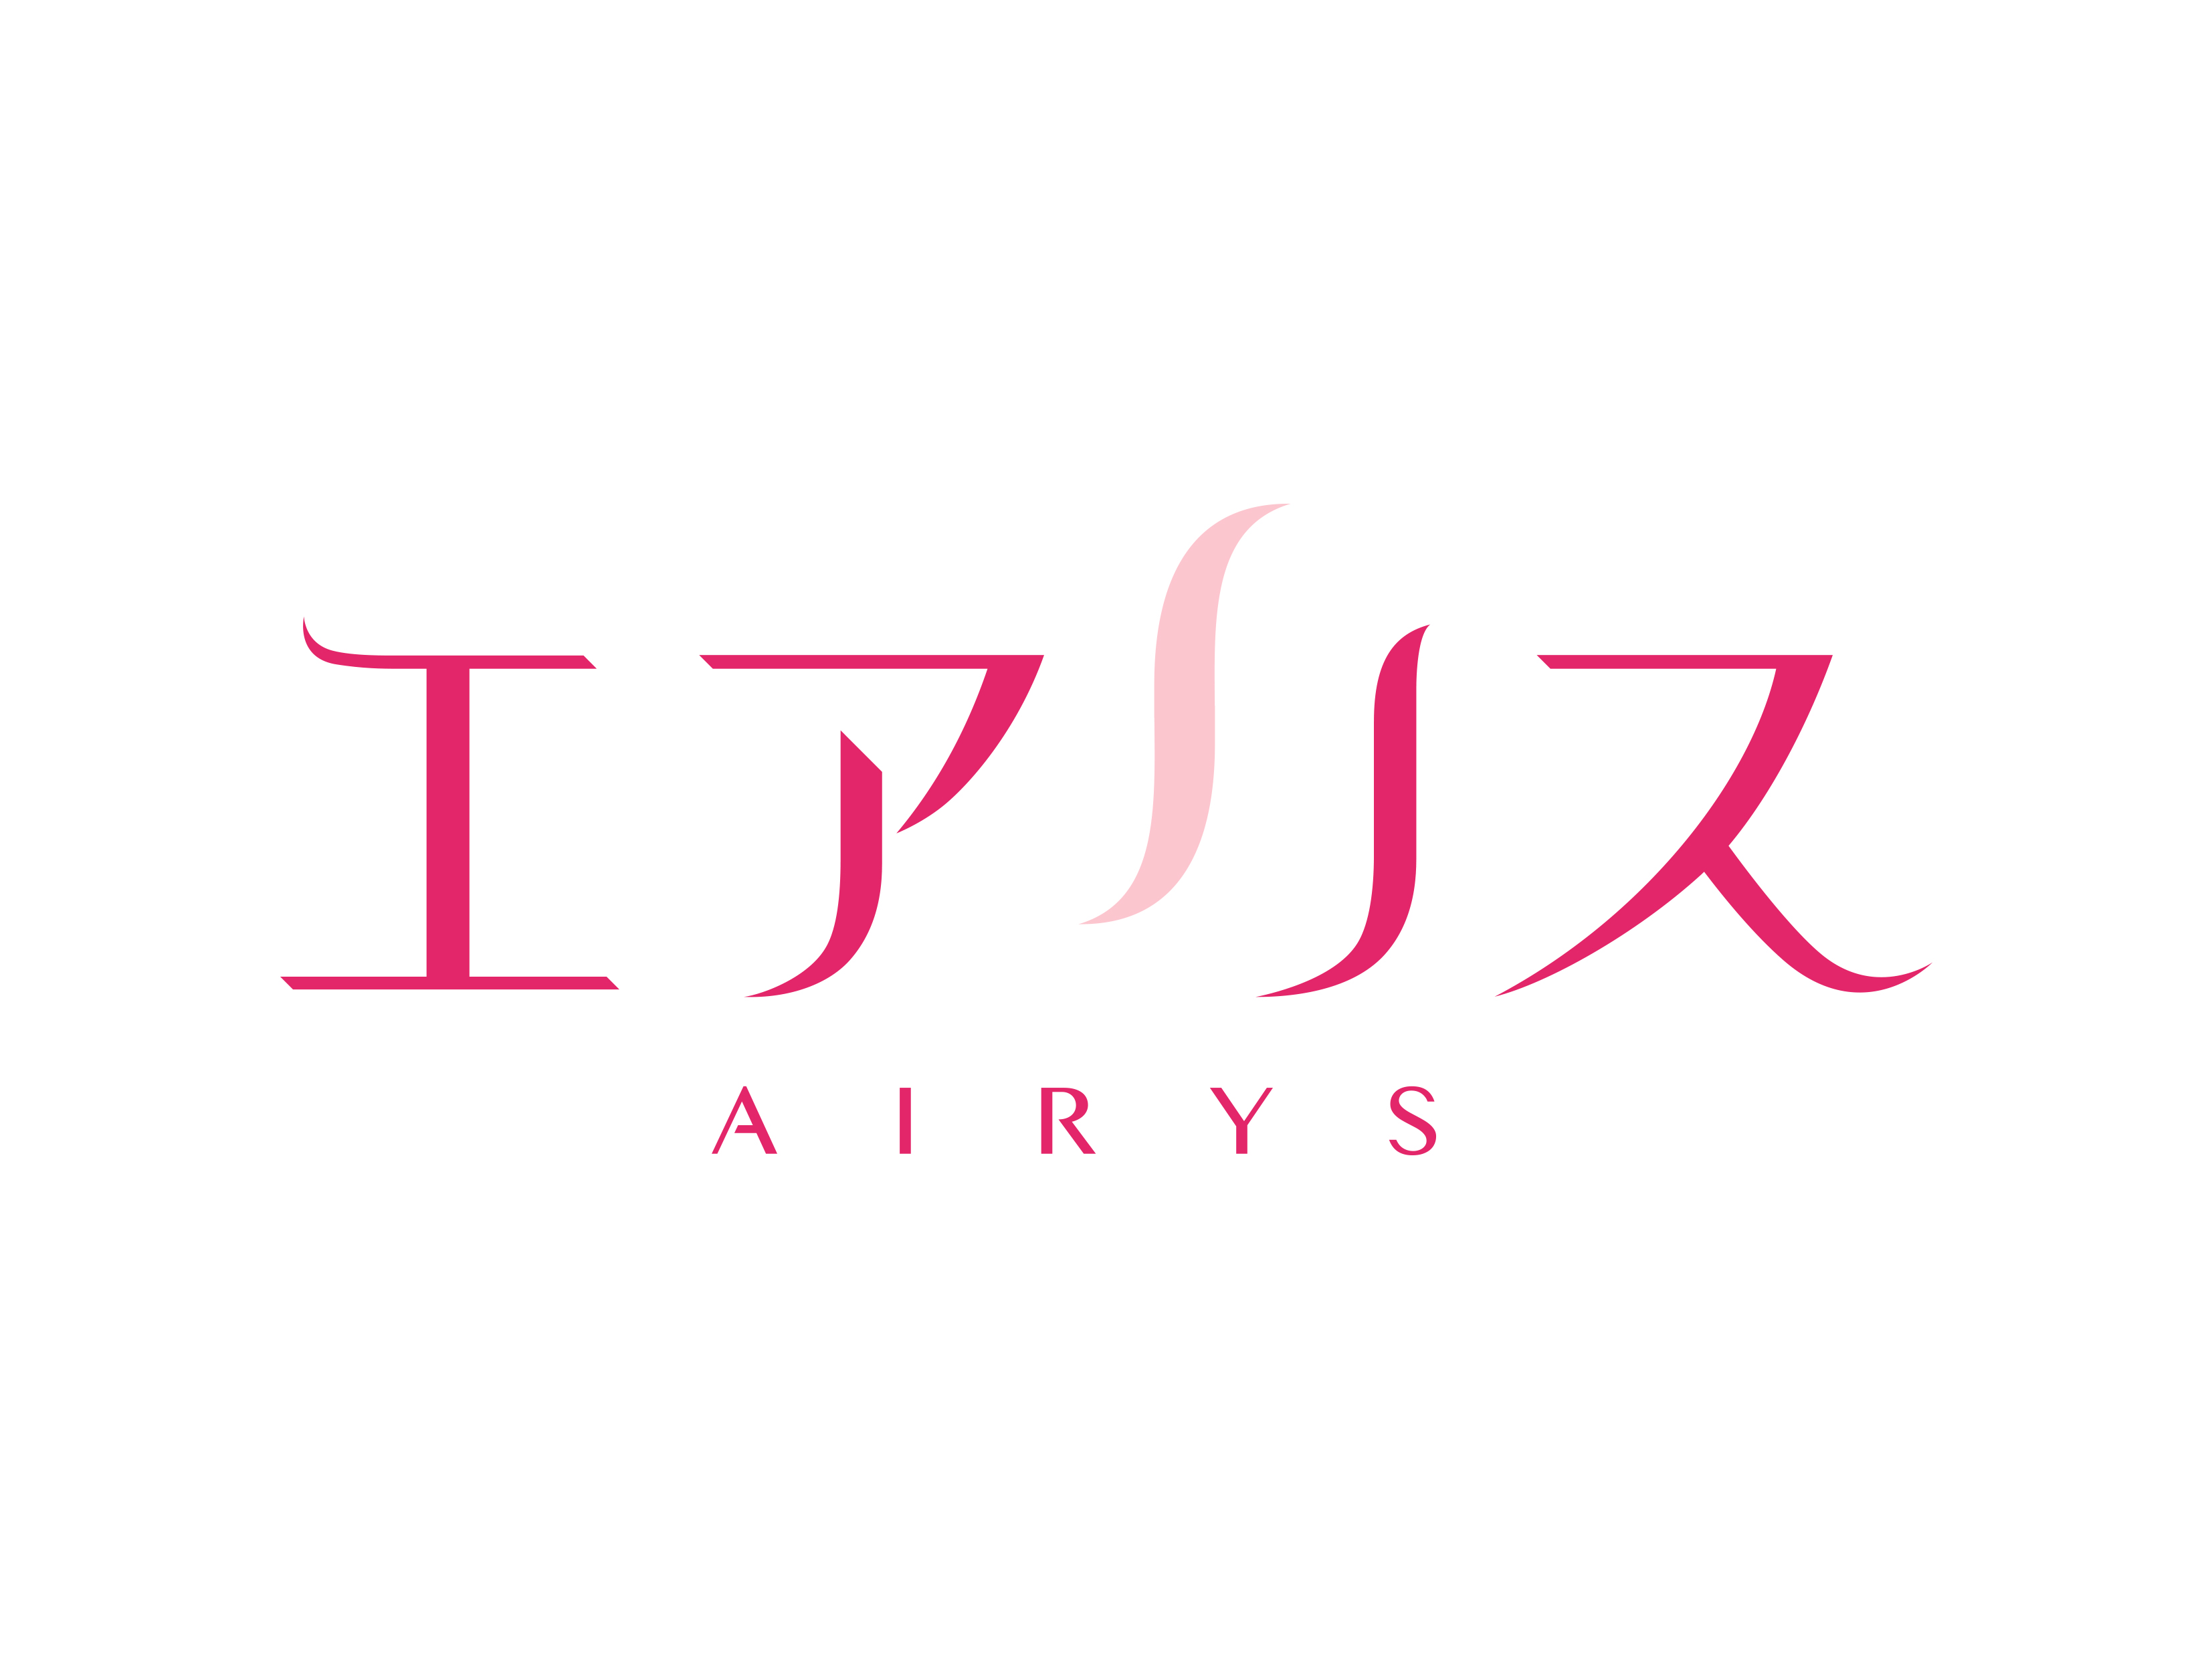 airys_1